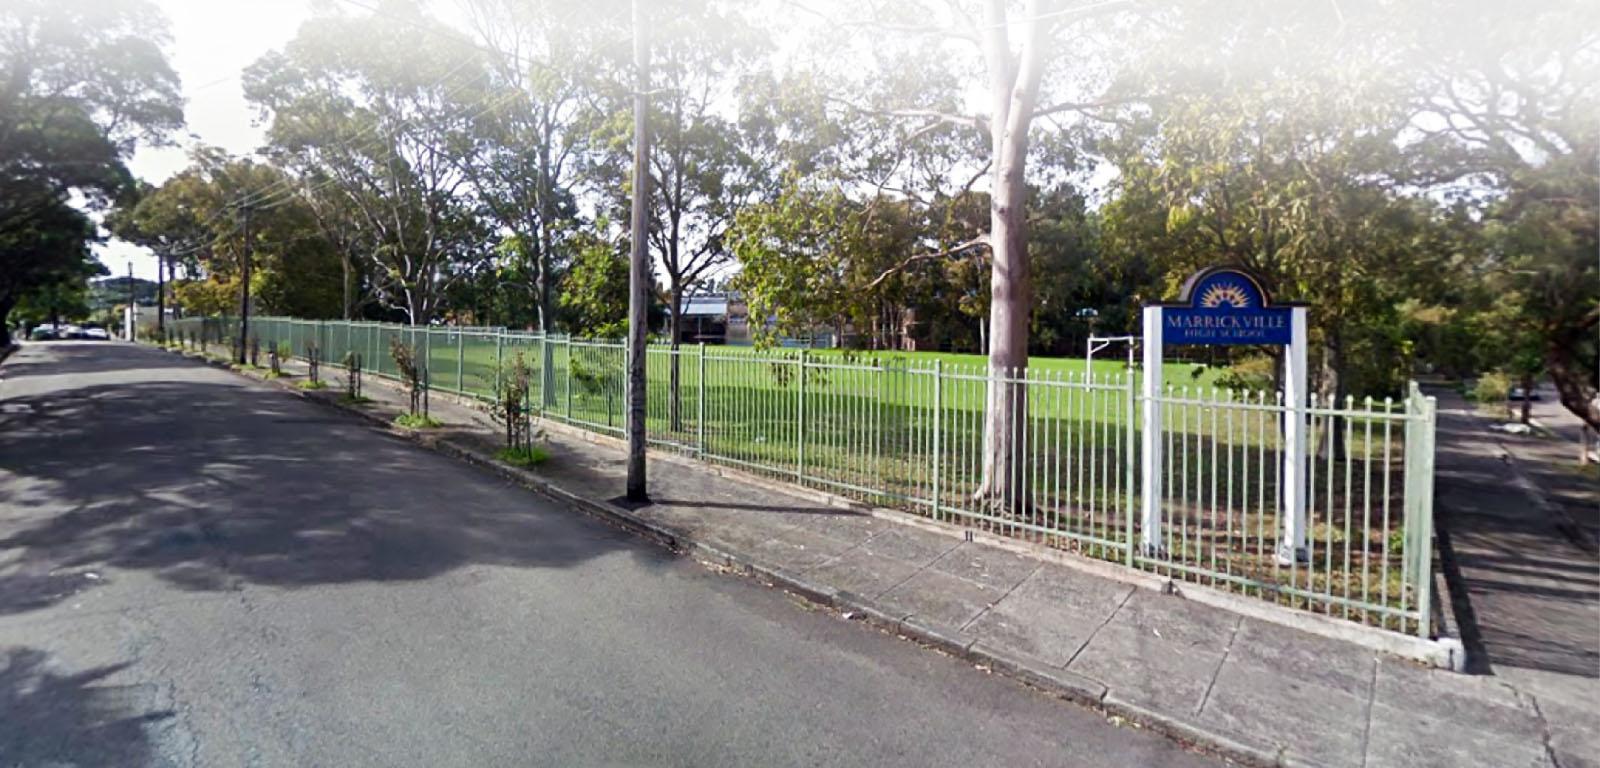 School image 2